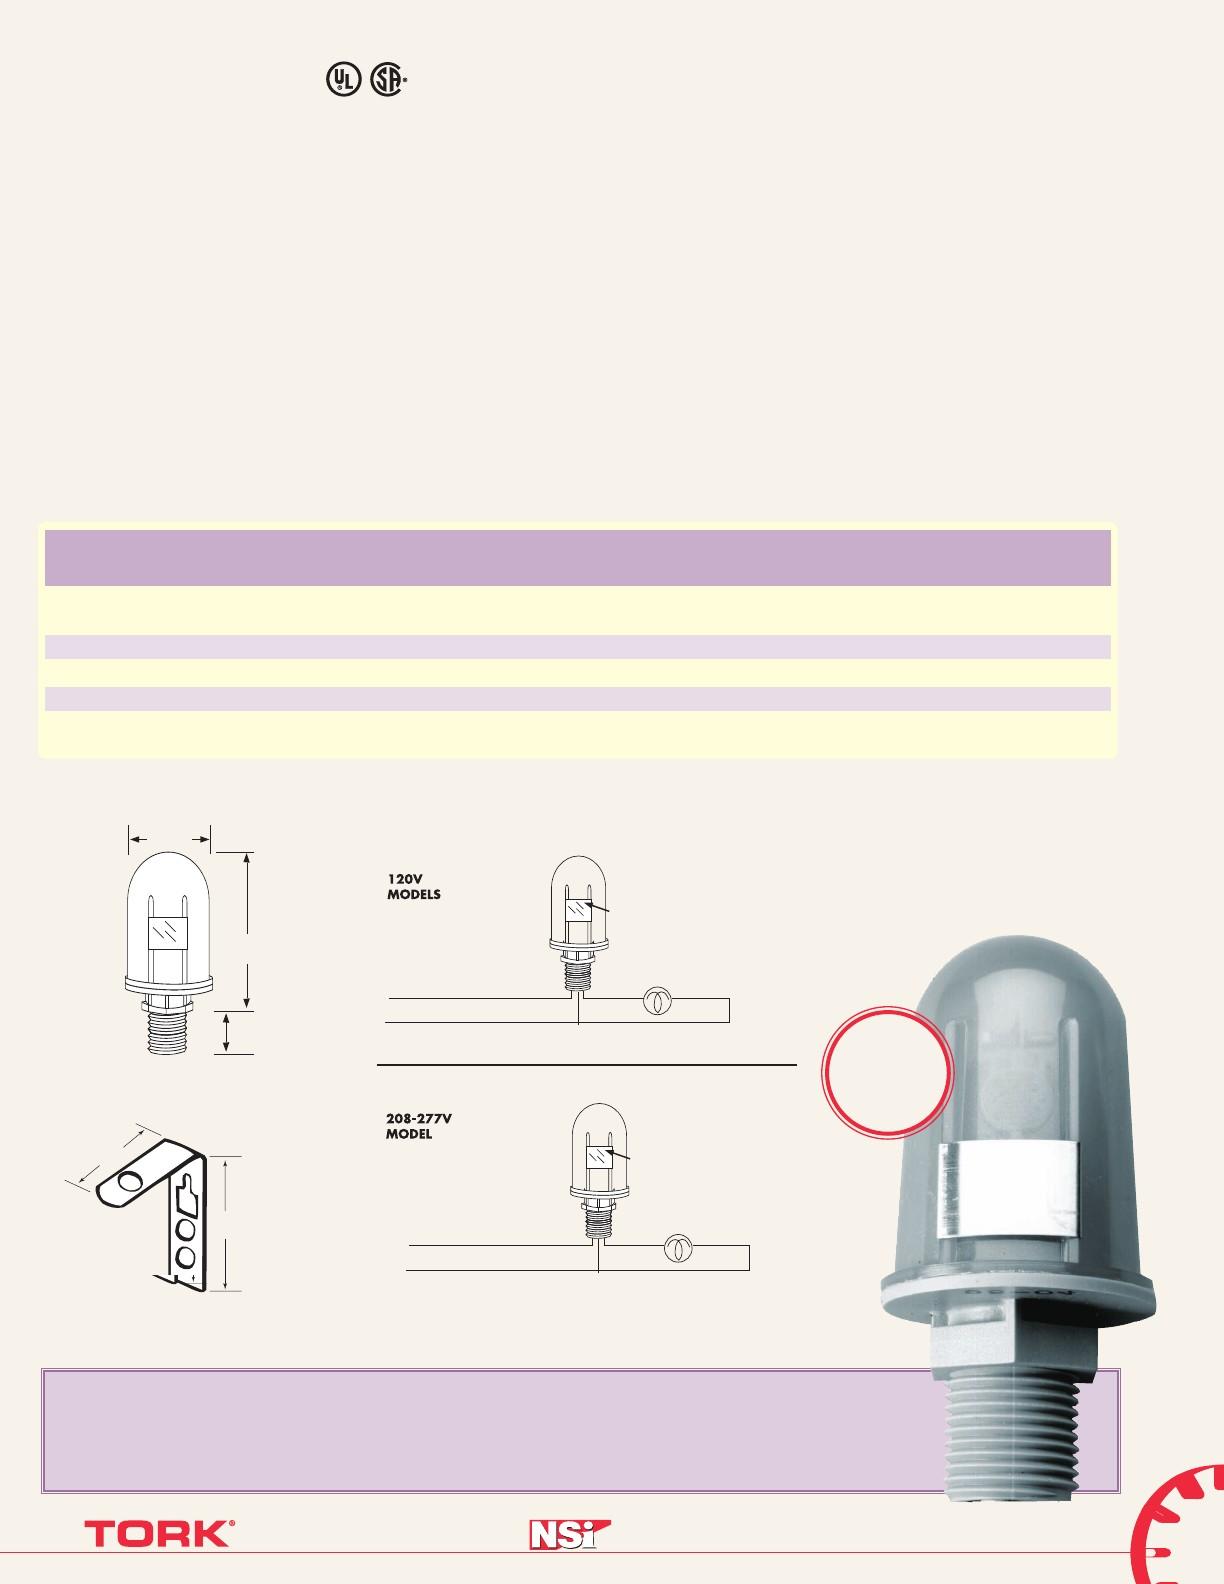 Tork Wiring Schematic for Lighting Contactor and Photocell Catalog Of Tork Wiring Schematic for Lighting Contactor and Photocell F62dca3 tork Lighting Contactor Wiring Diagram